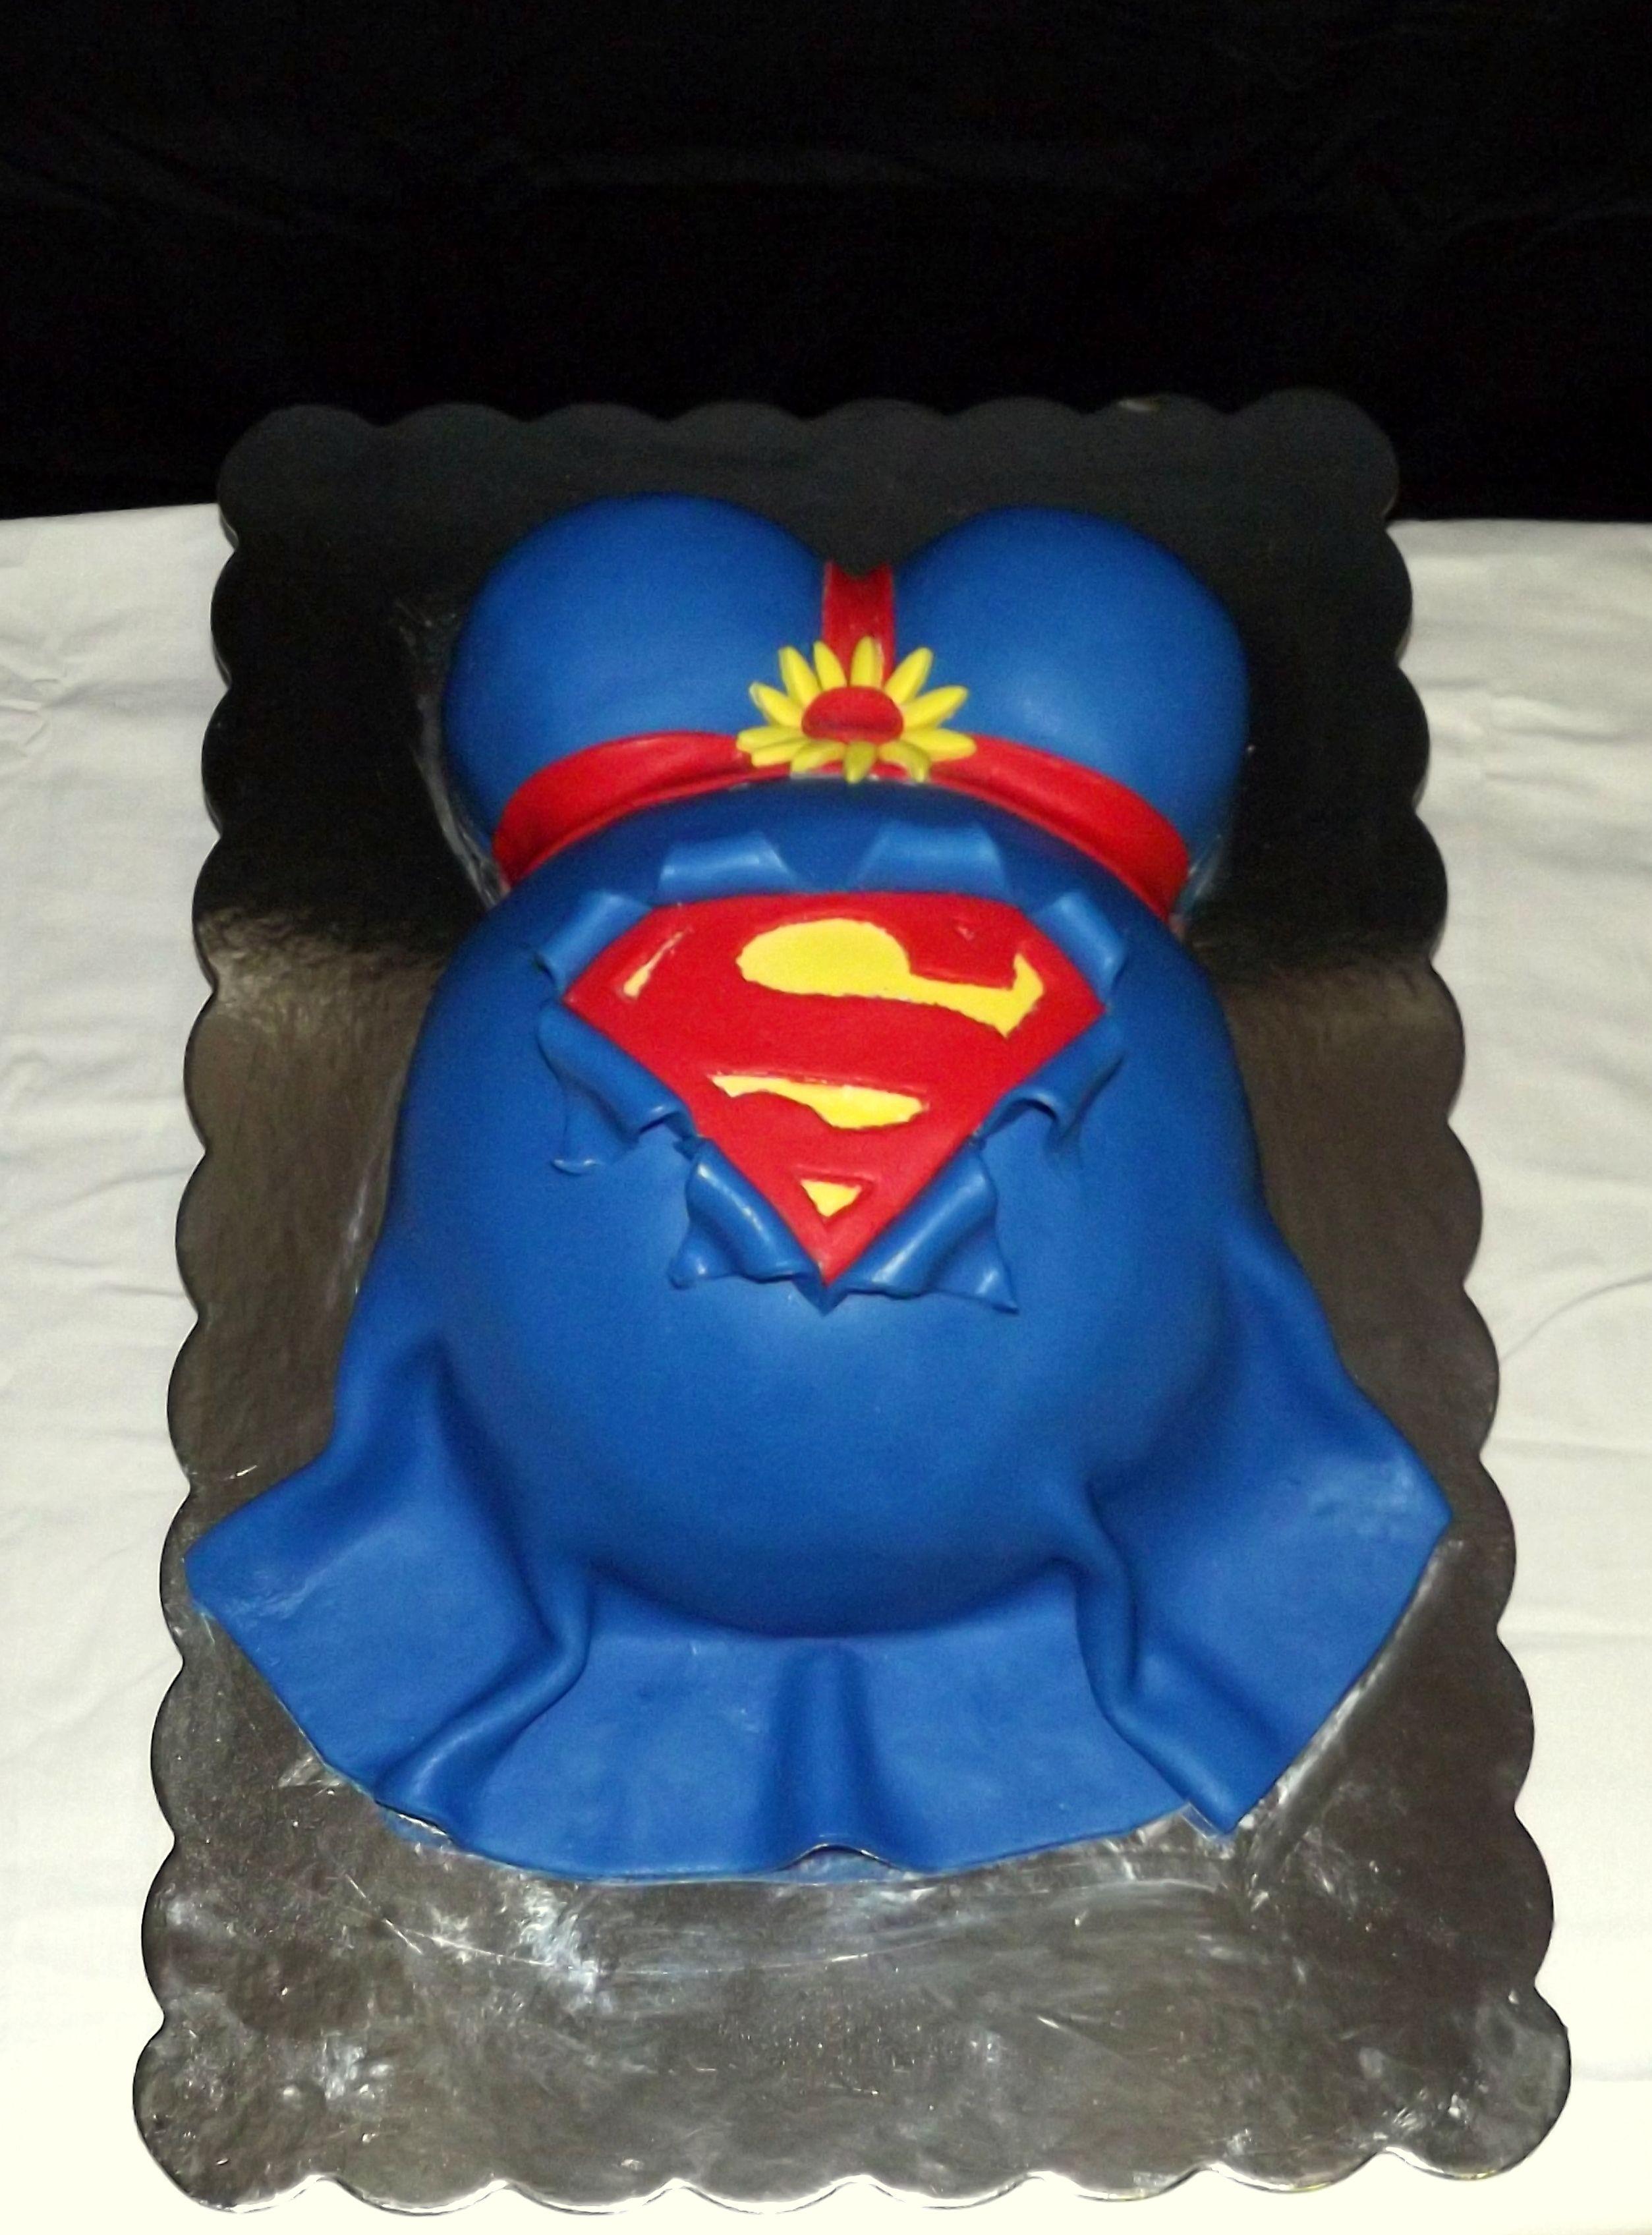 ... Superman Baby Shower Ideas On Pinterest. Updated: ...